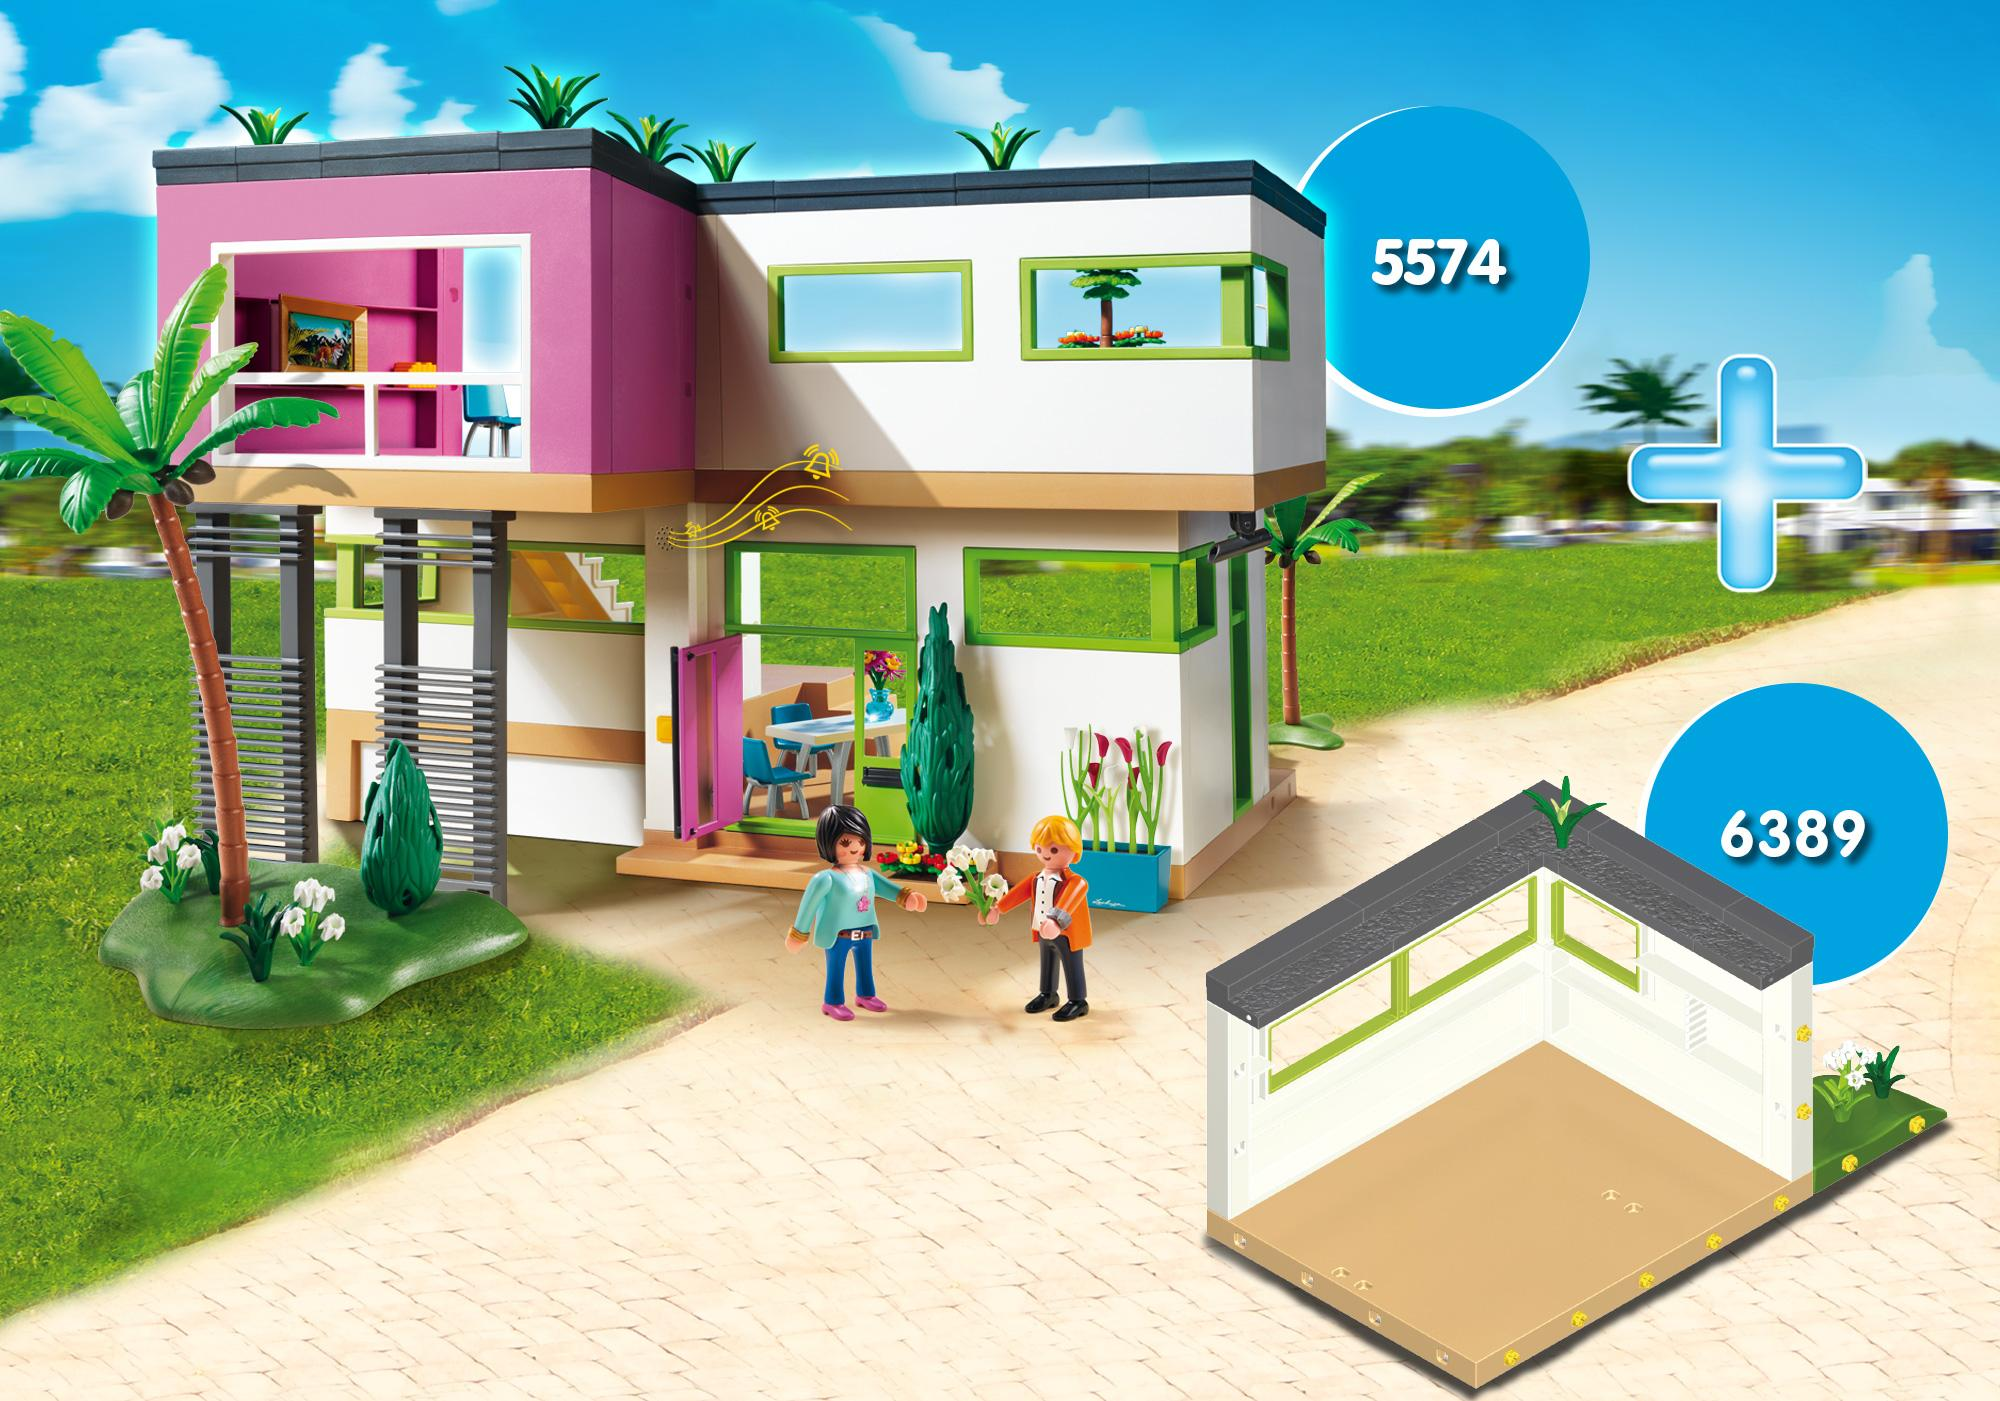 http://media.playmobil.com/i/playmobil/PM1905K_product_detail/Bundle Luxusvilla (DS Exklusiv)